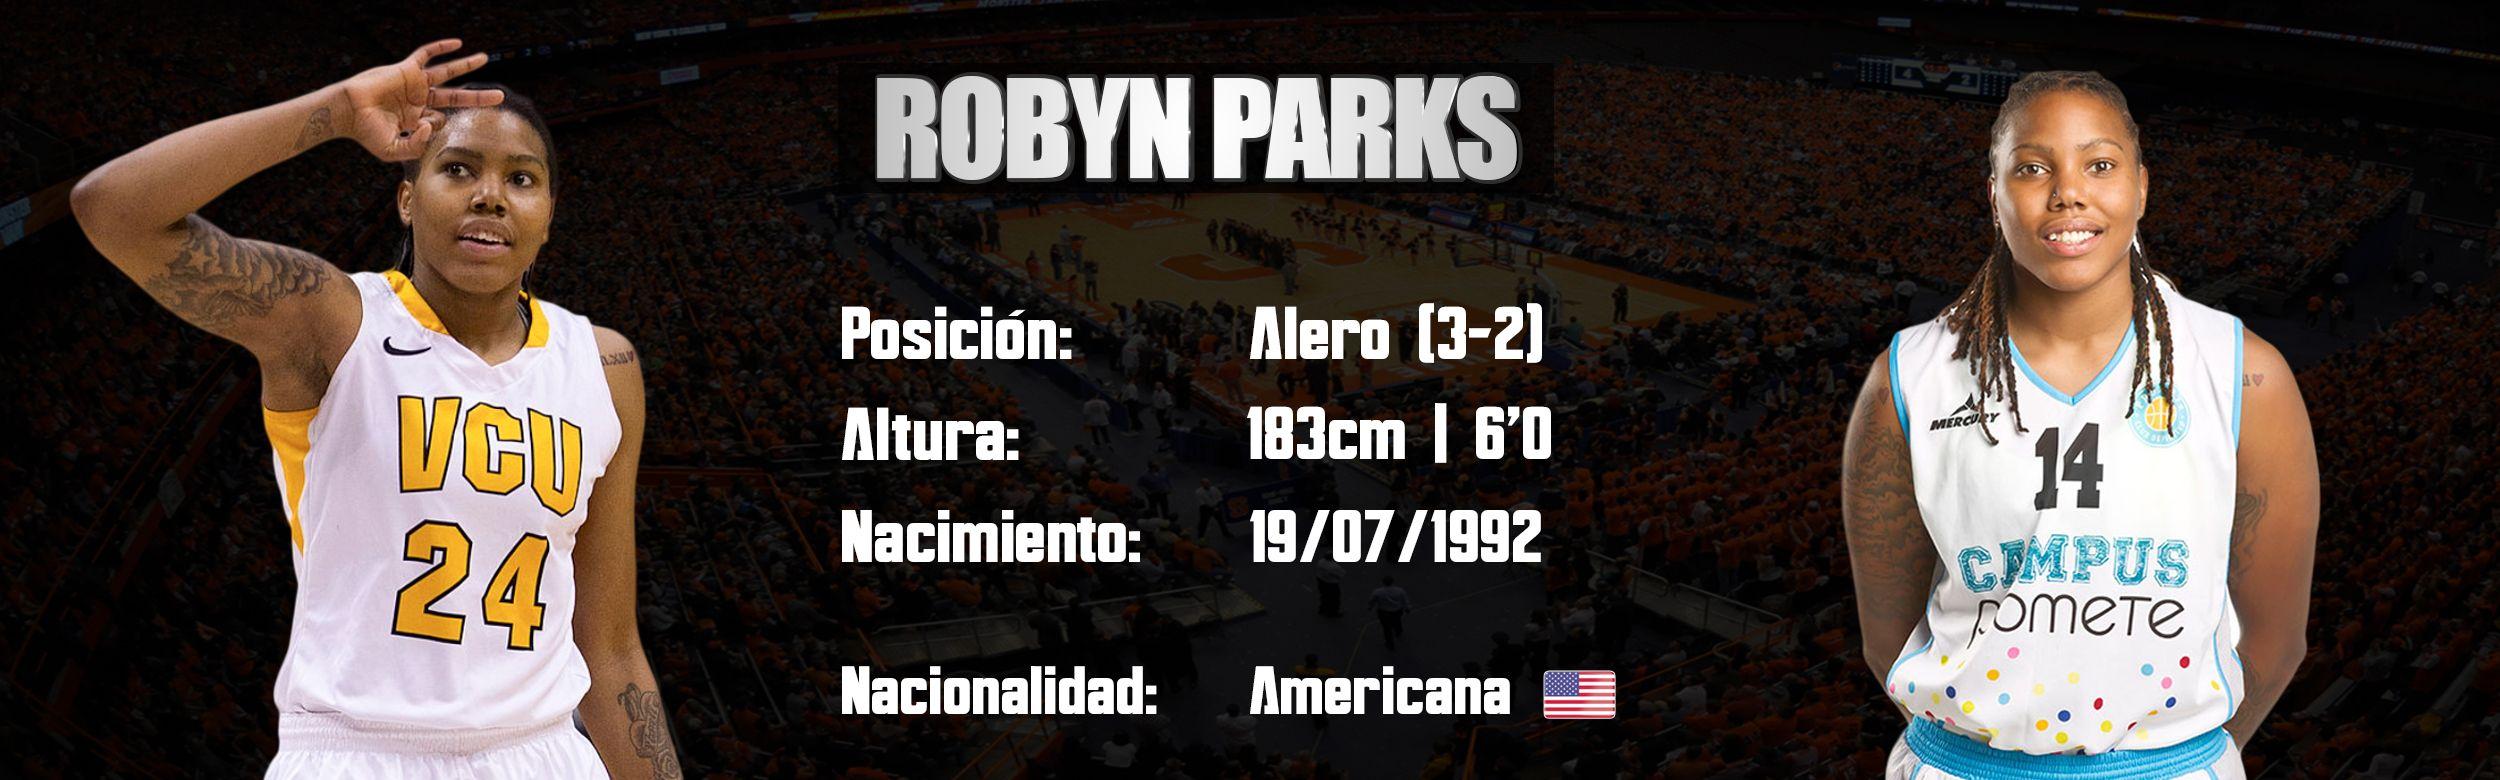 Robyn Parks